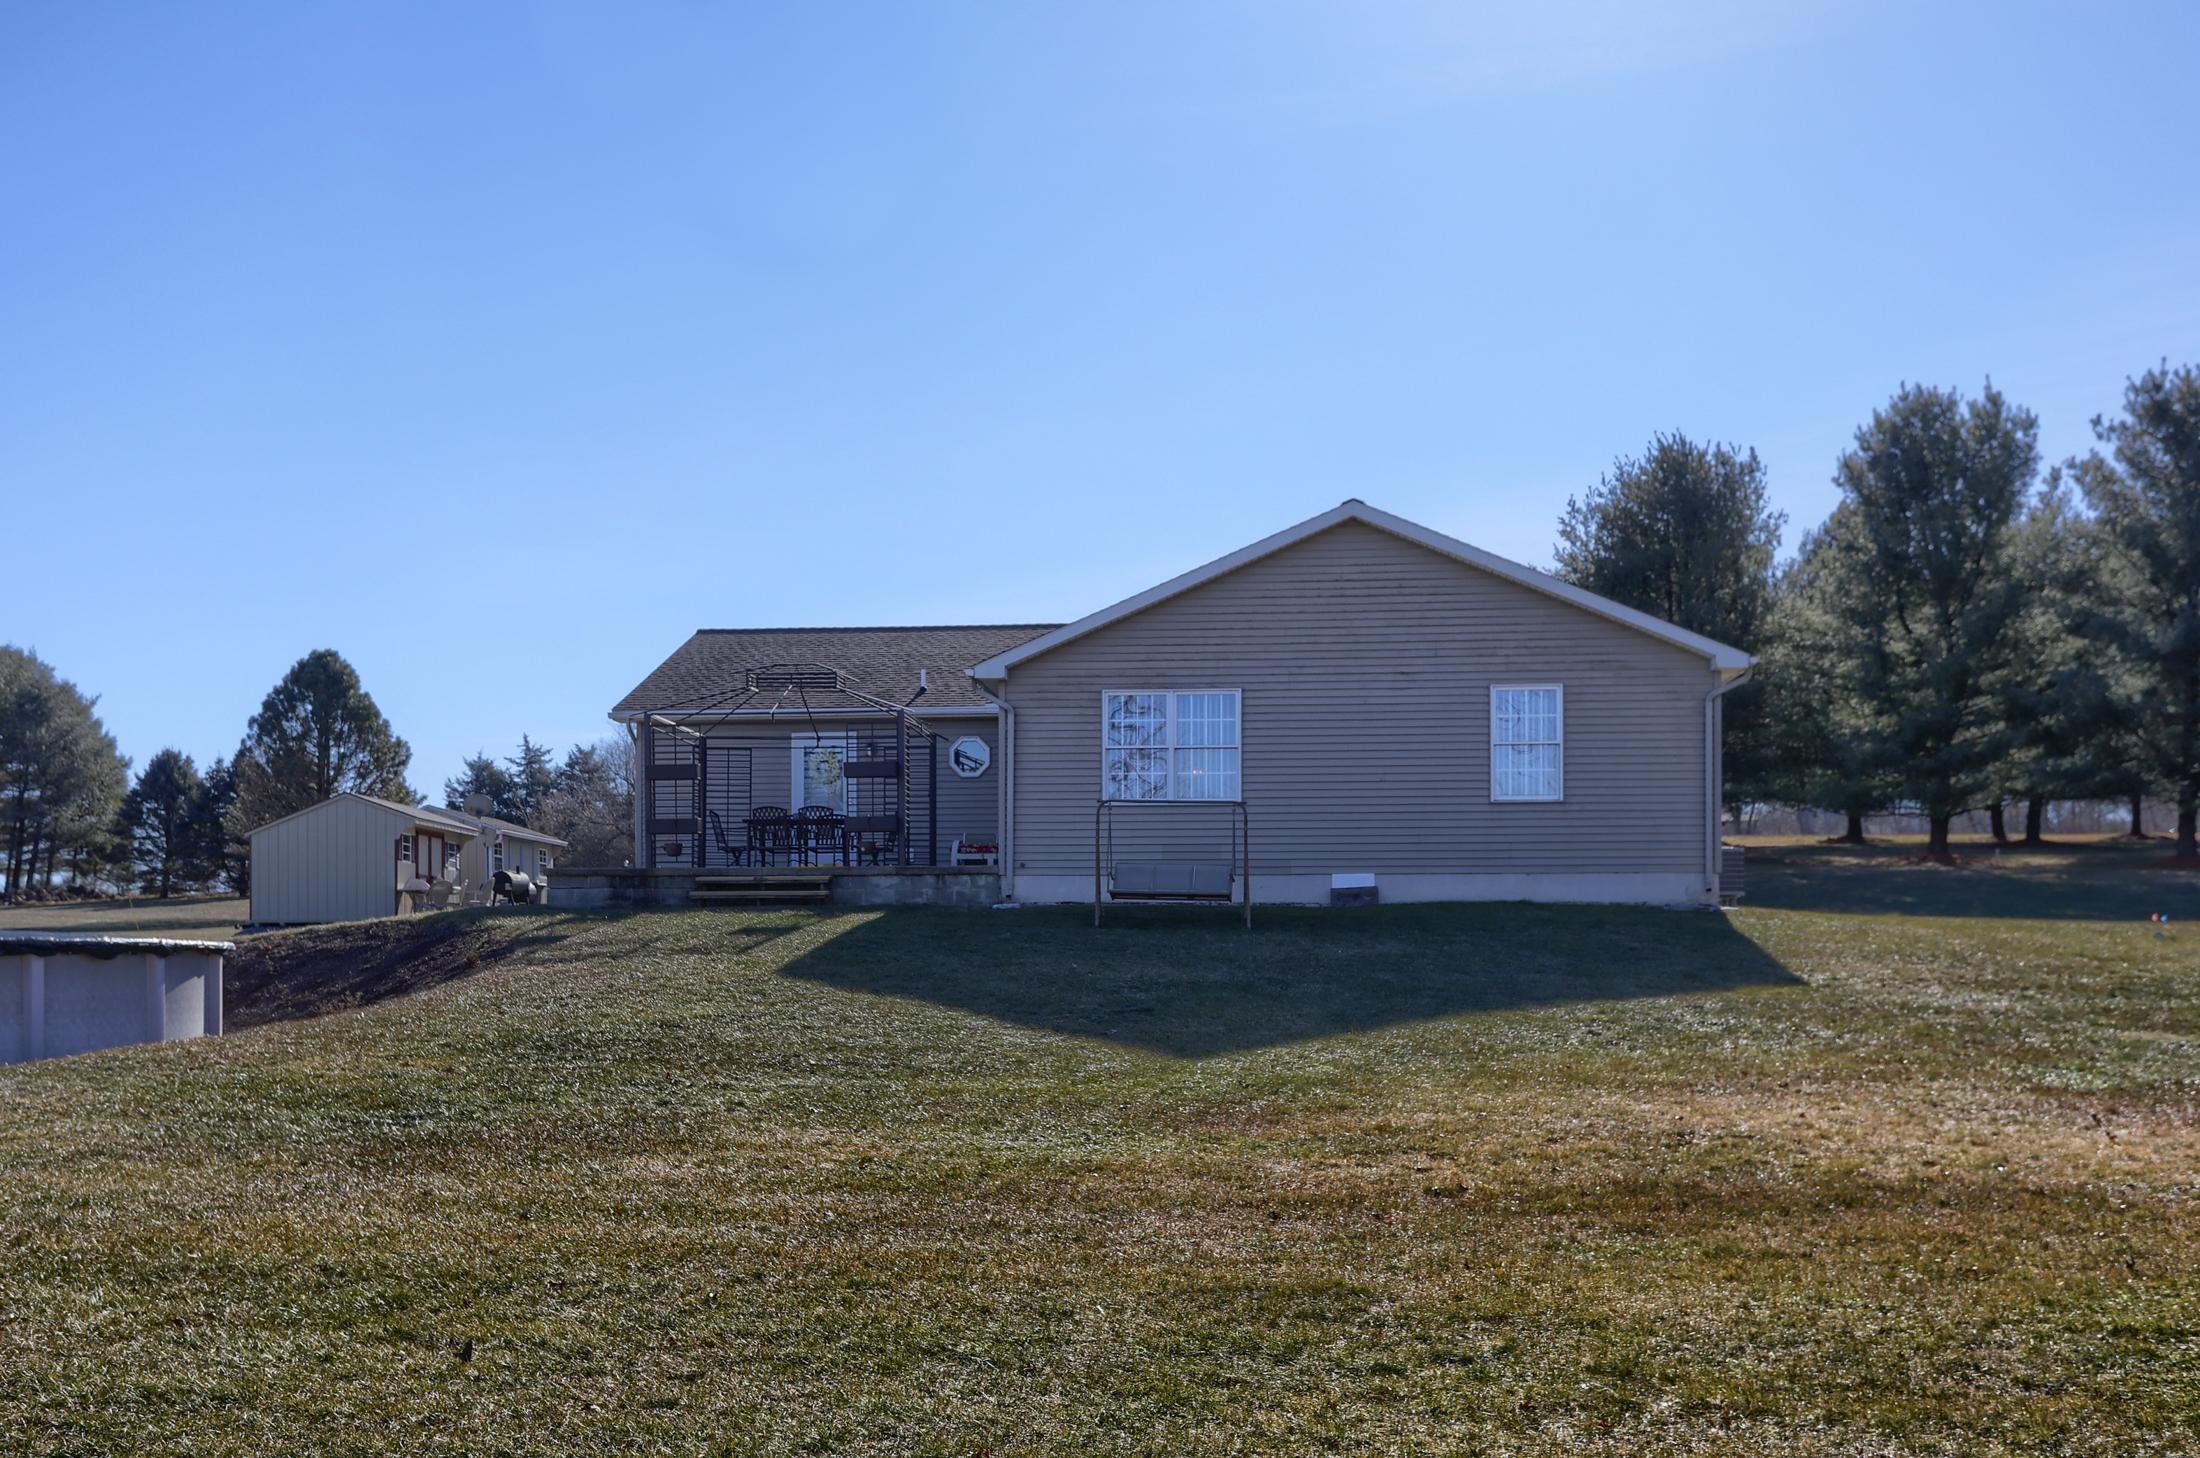 26 W. Strack Drive - yard 4